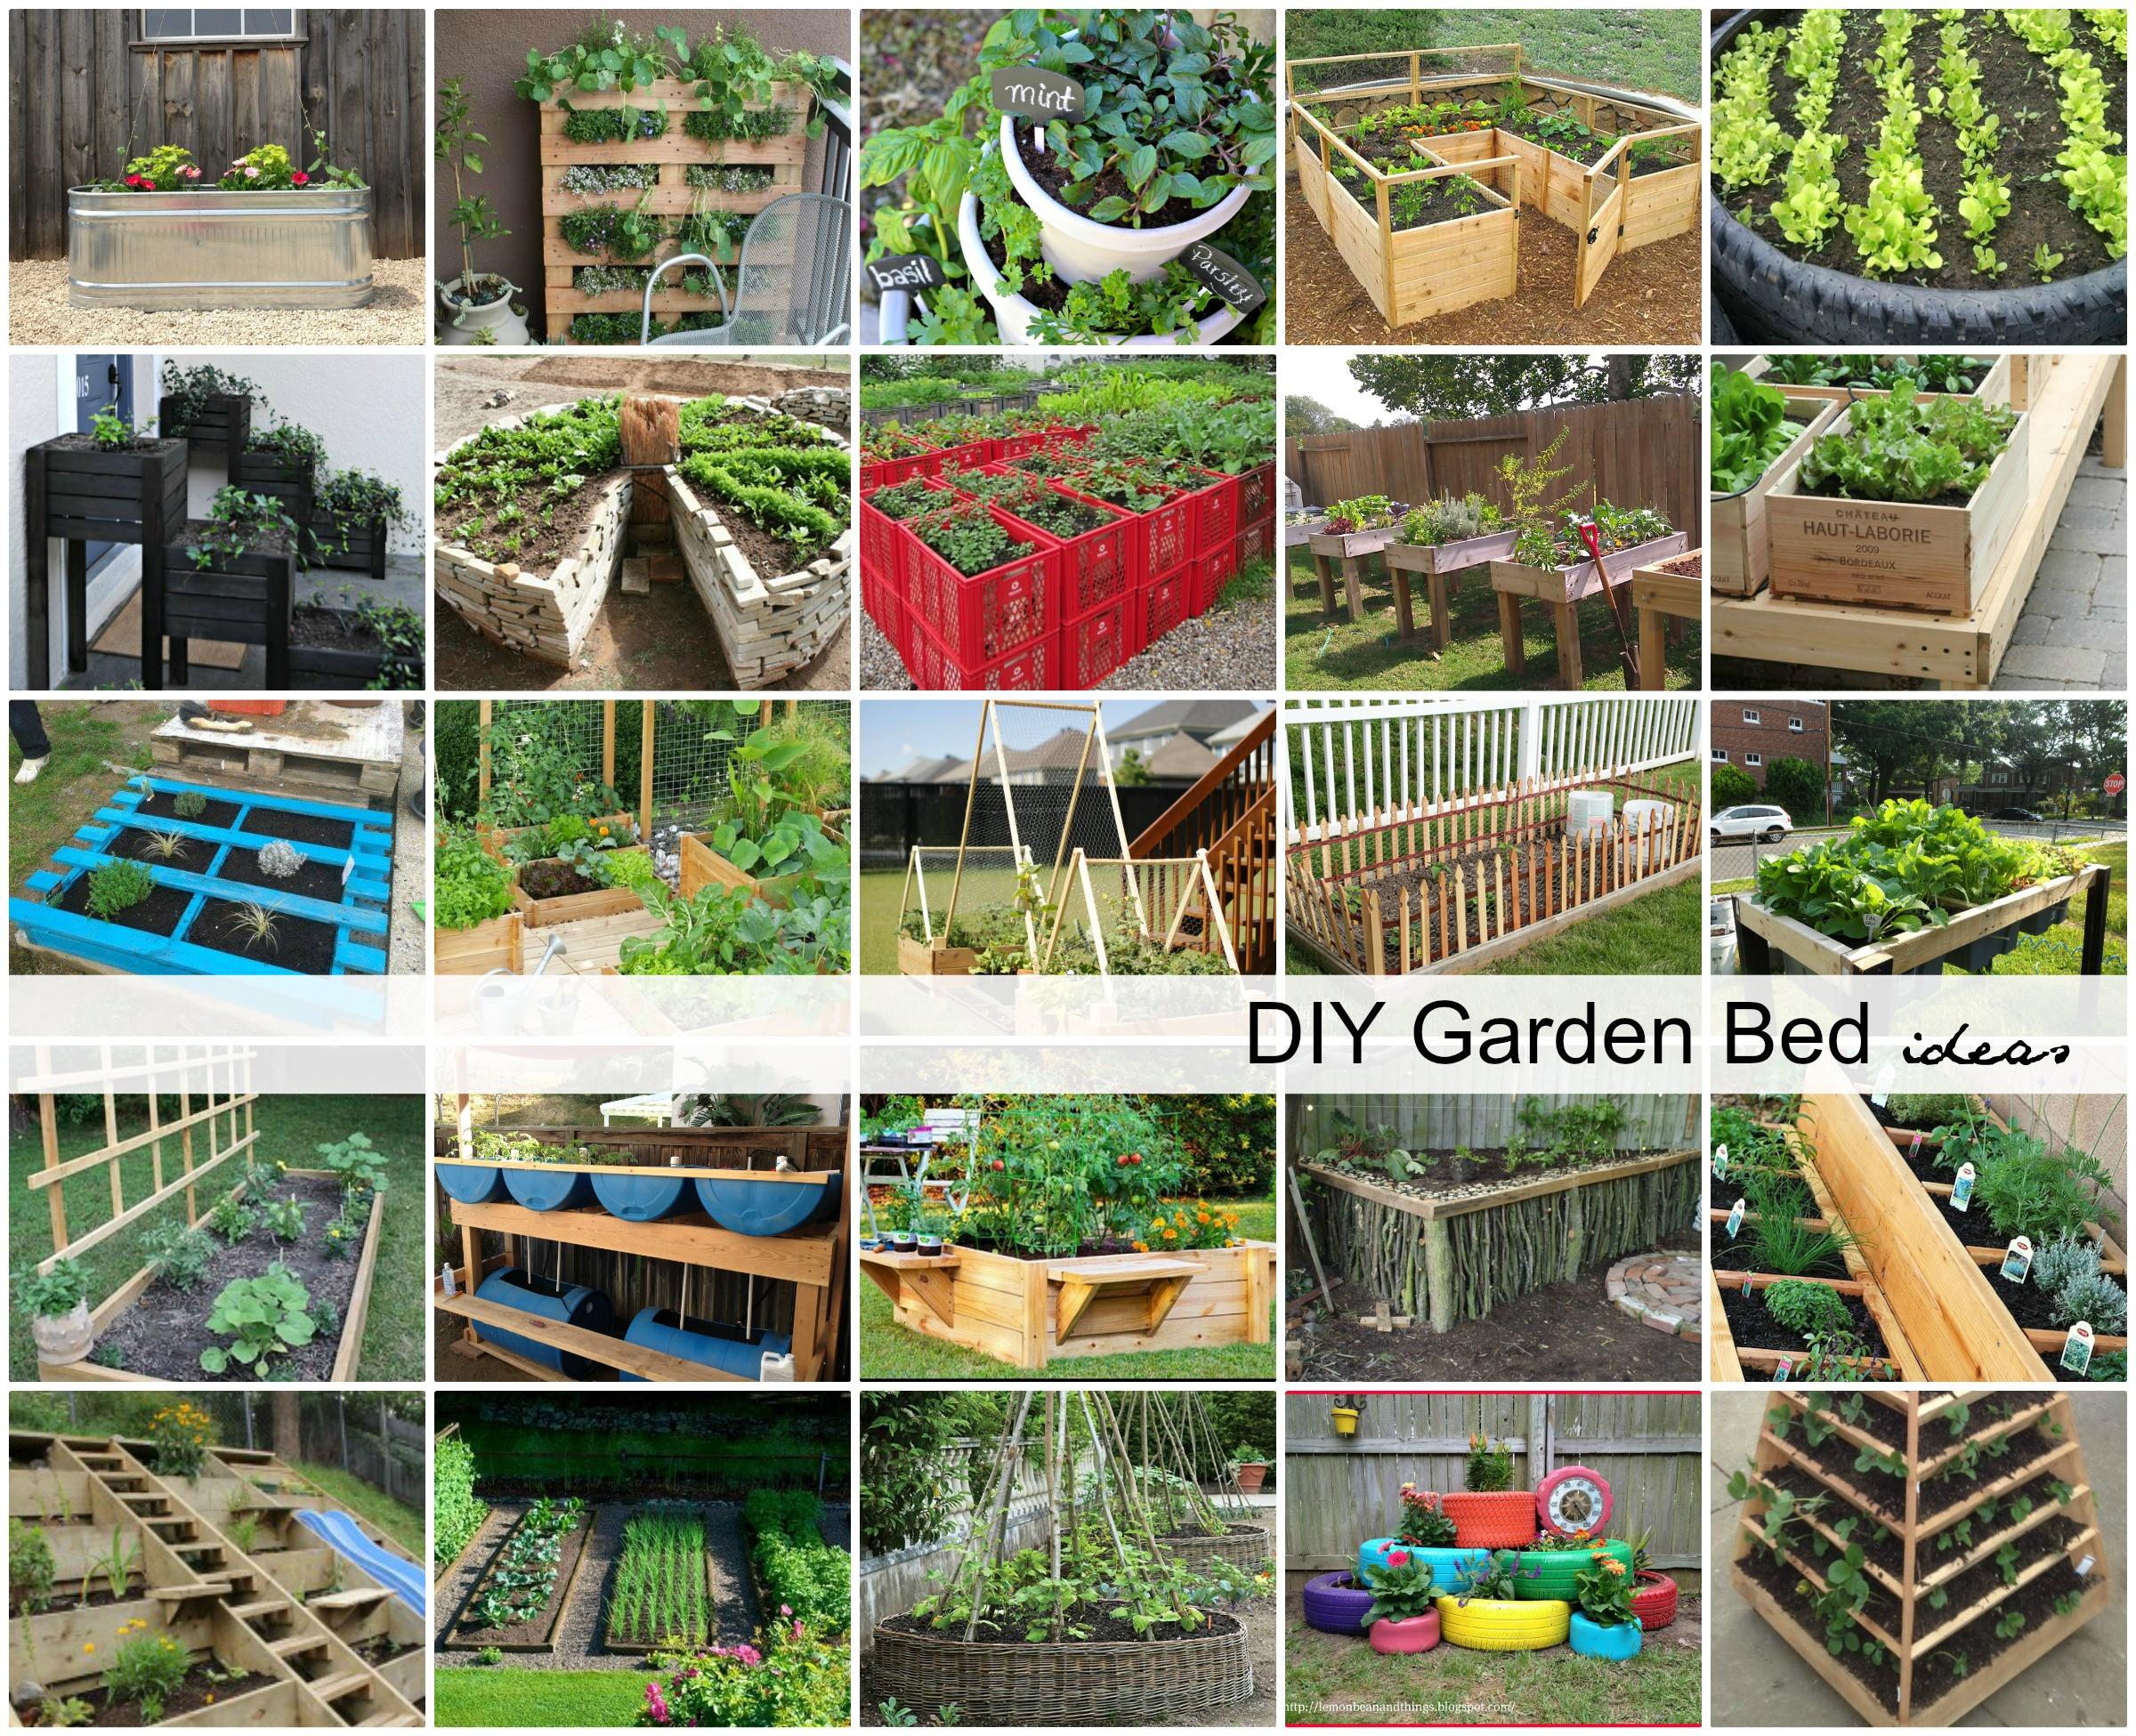 Best ideas about Garden Ideas Diy . Save or Pin Garden Marker Ideas The Idea Room Now.